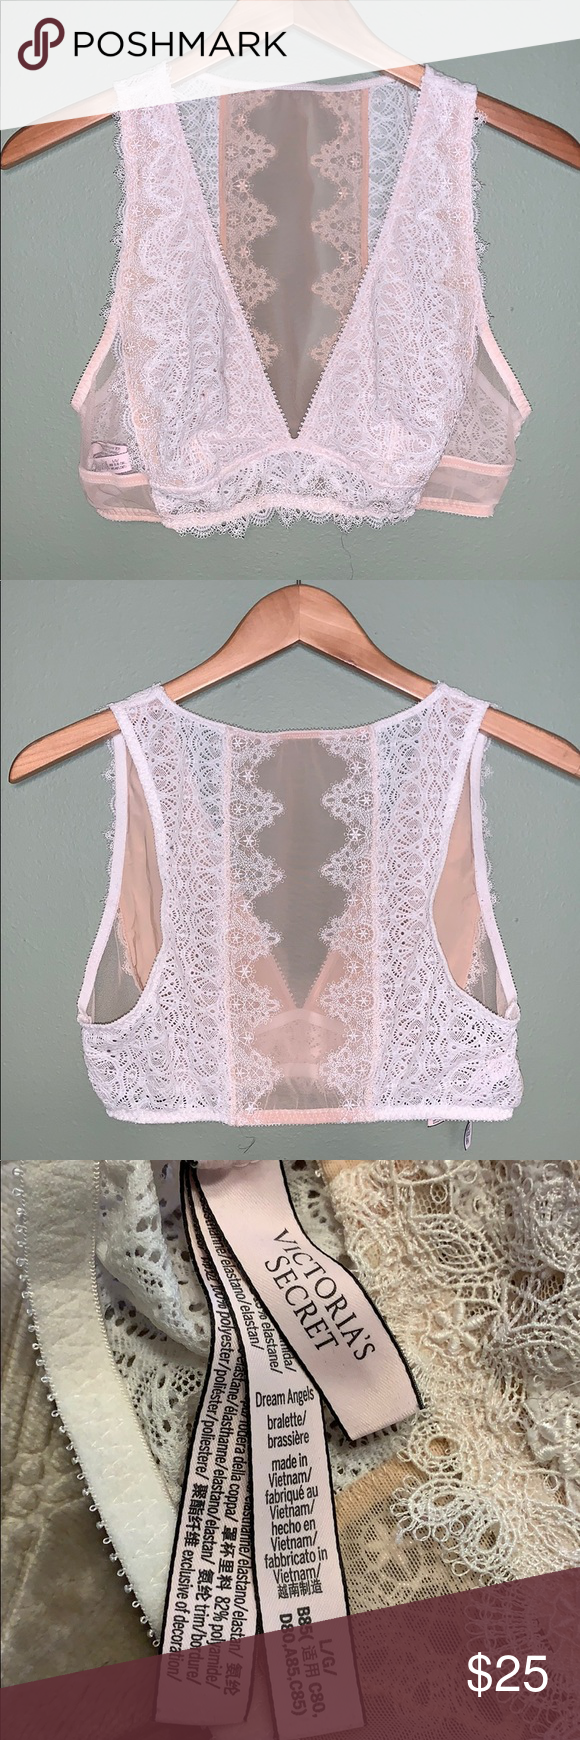 Victoria/'s Secret Dream Angels Lace-Up Bralette Sheer Crochet Coconut White S